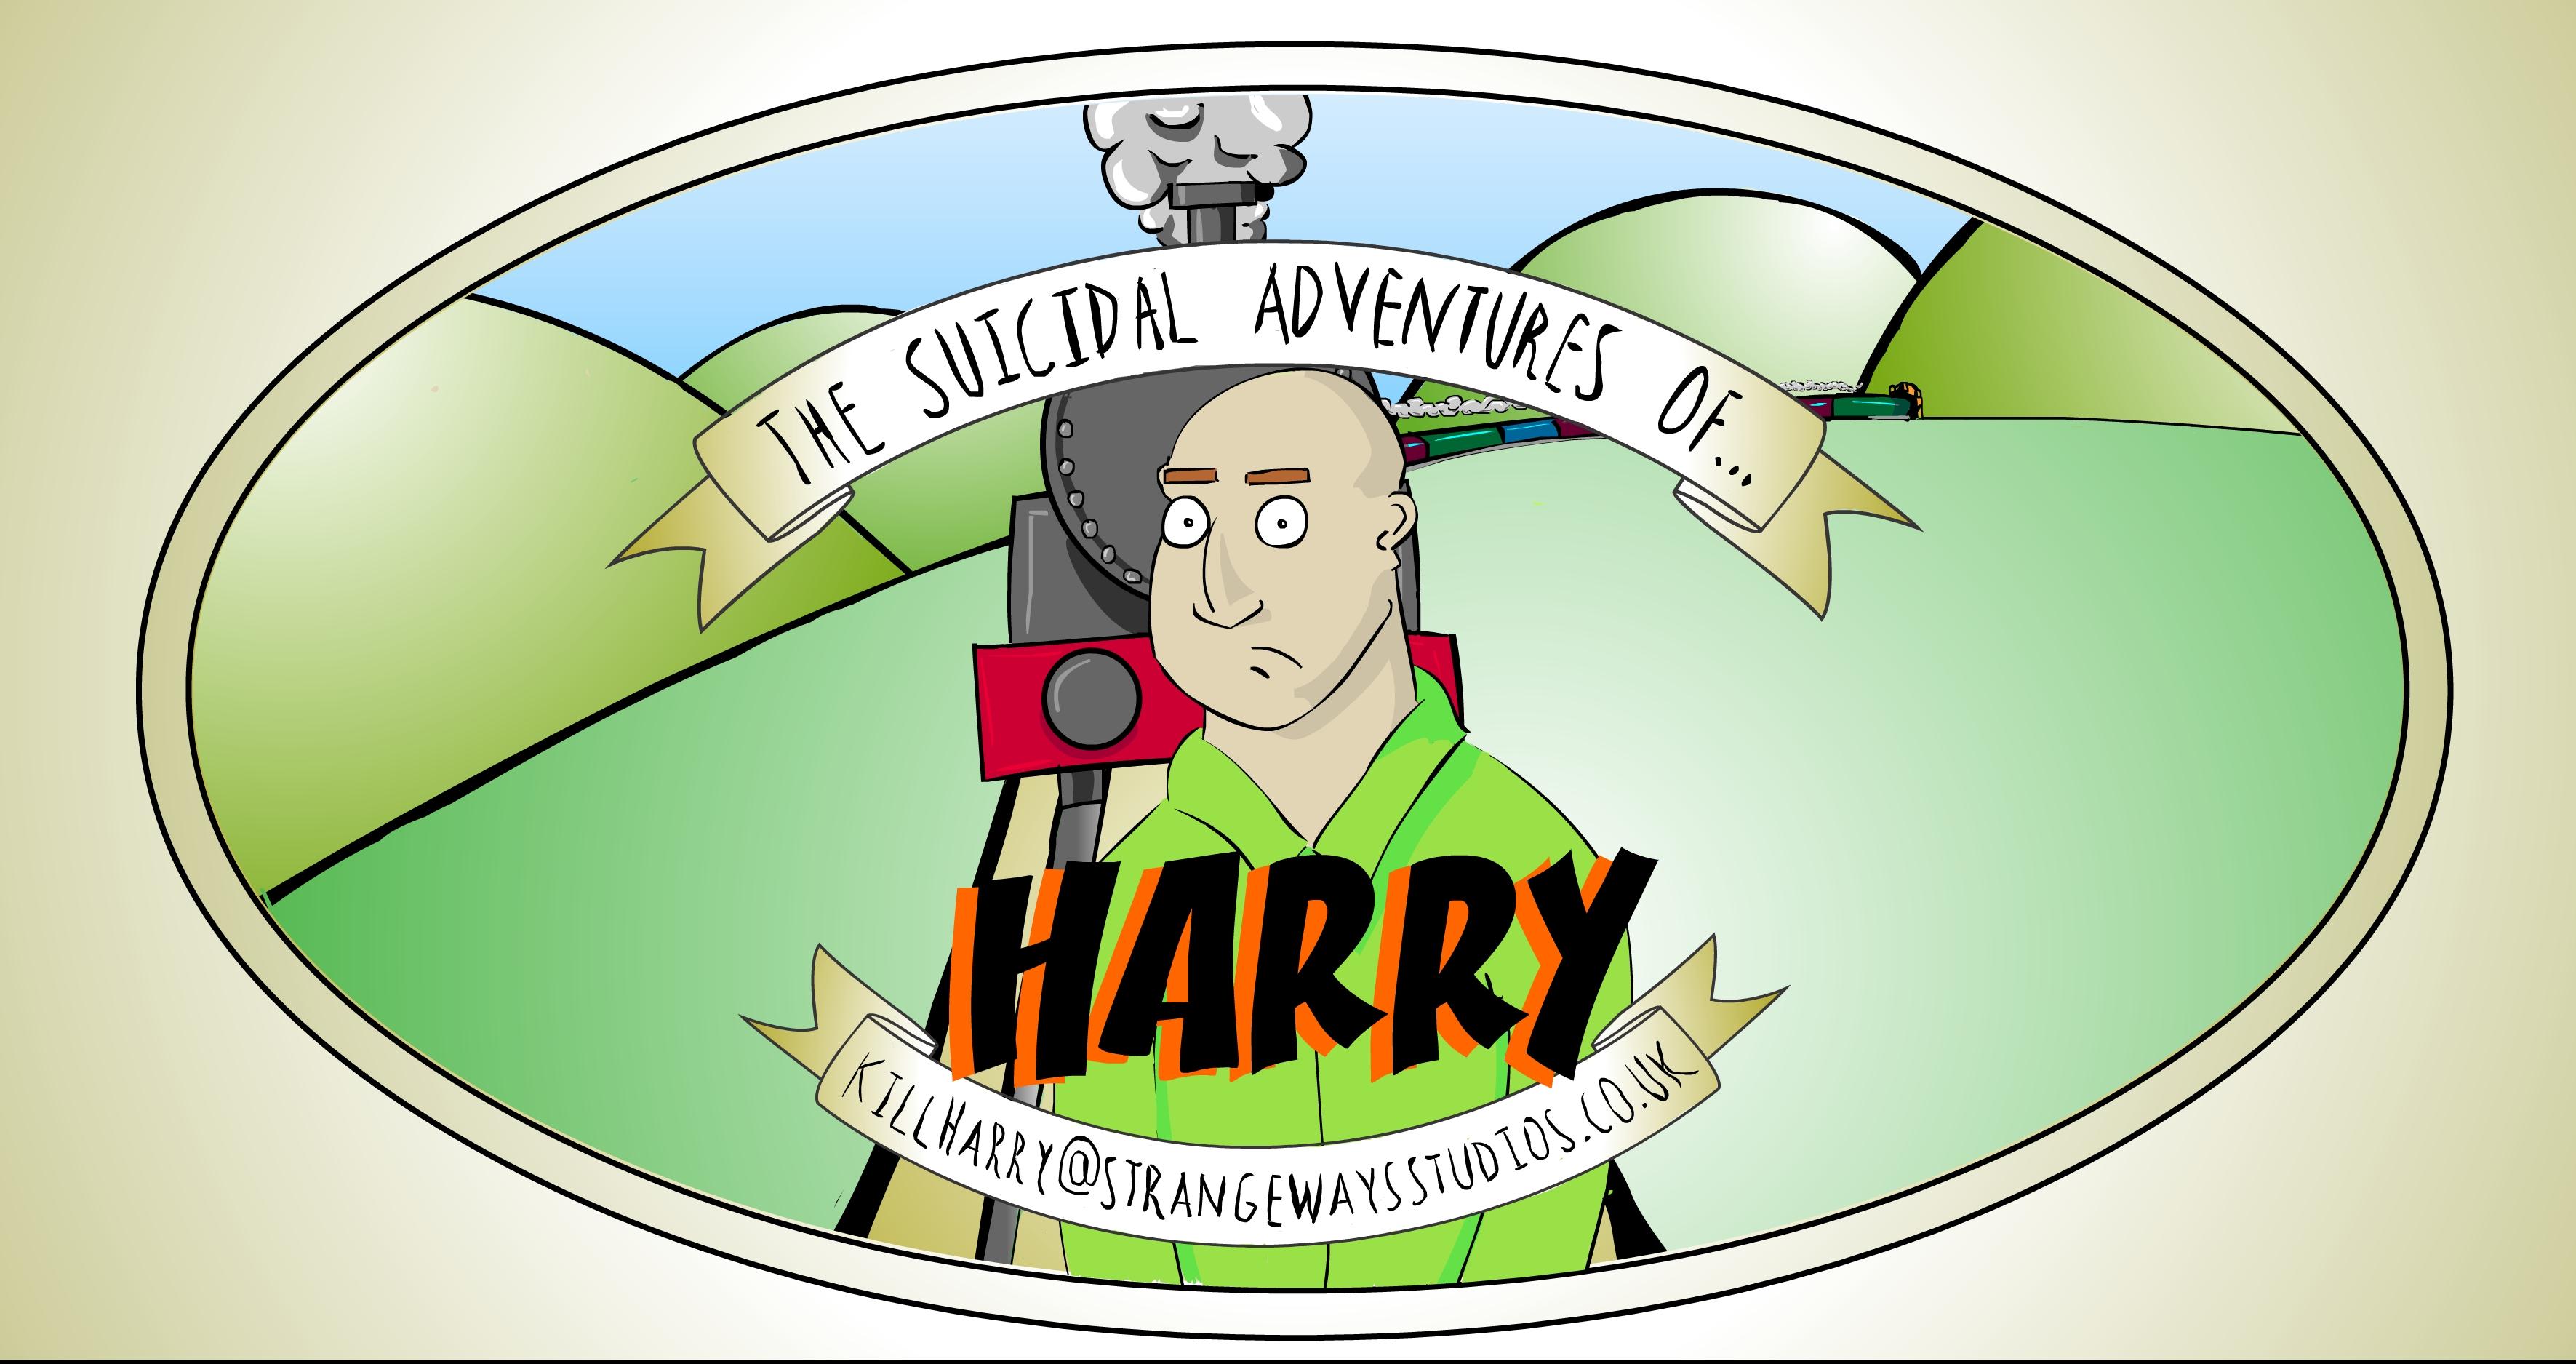 Help Harry by sending your suicidal suggestions to KillHarry@strangewaysstudios.co.uk